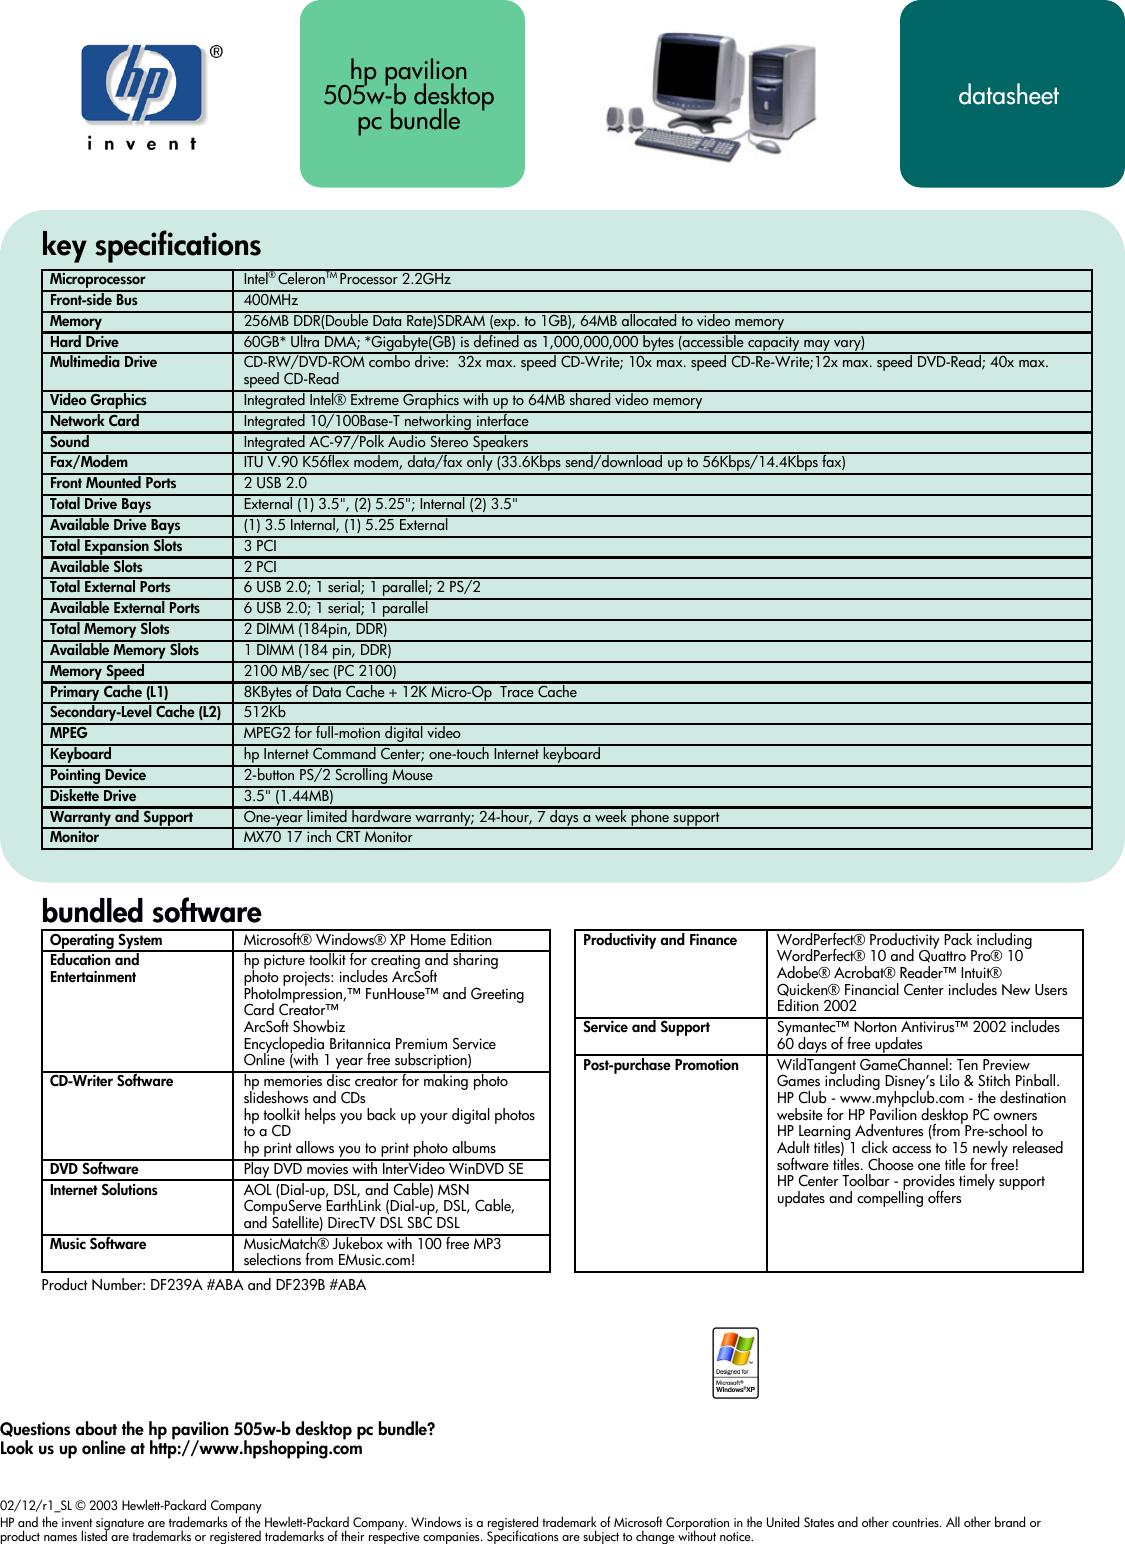 Hp Pavilion 505W Desktop Pc Us Specifications Data Sheet